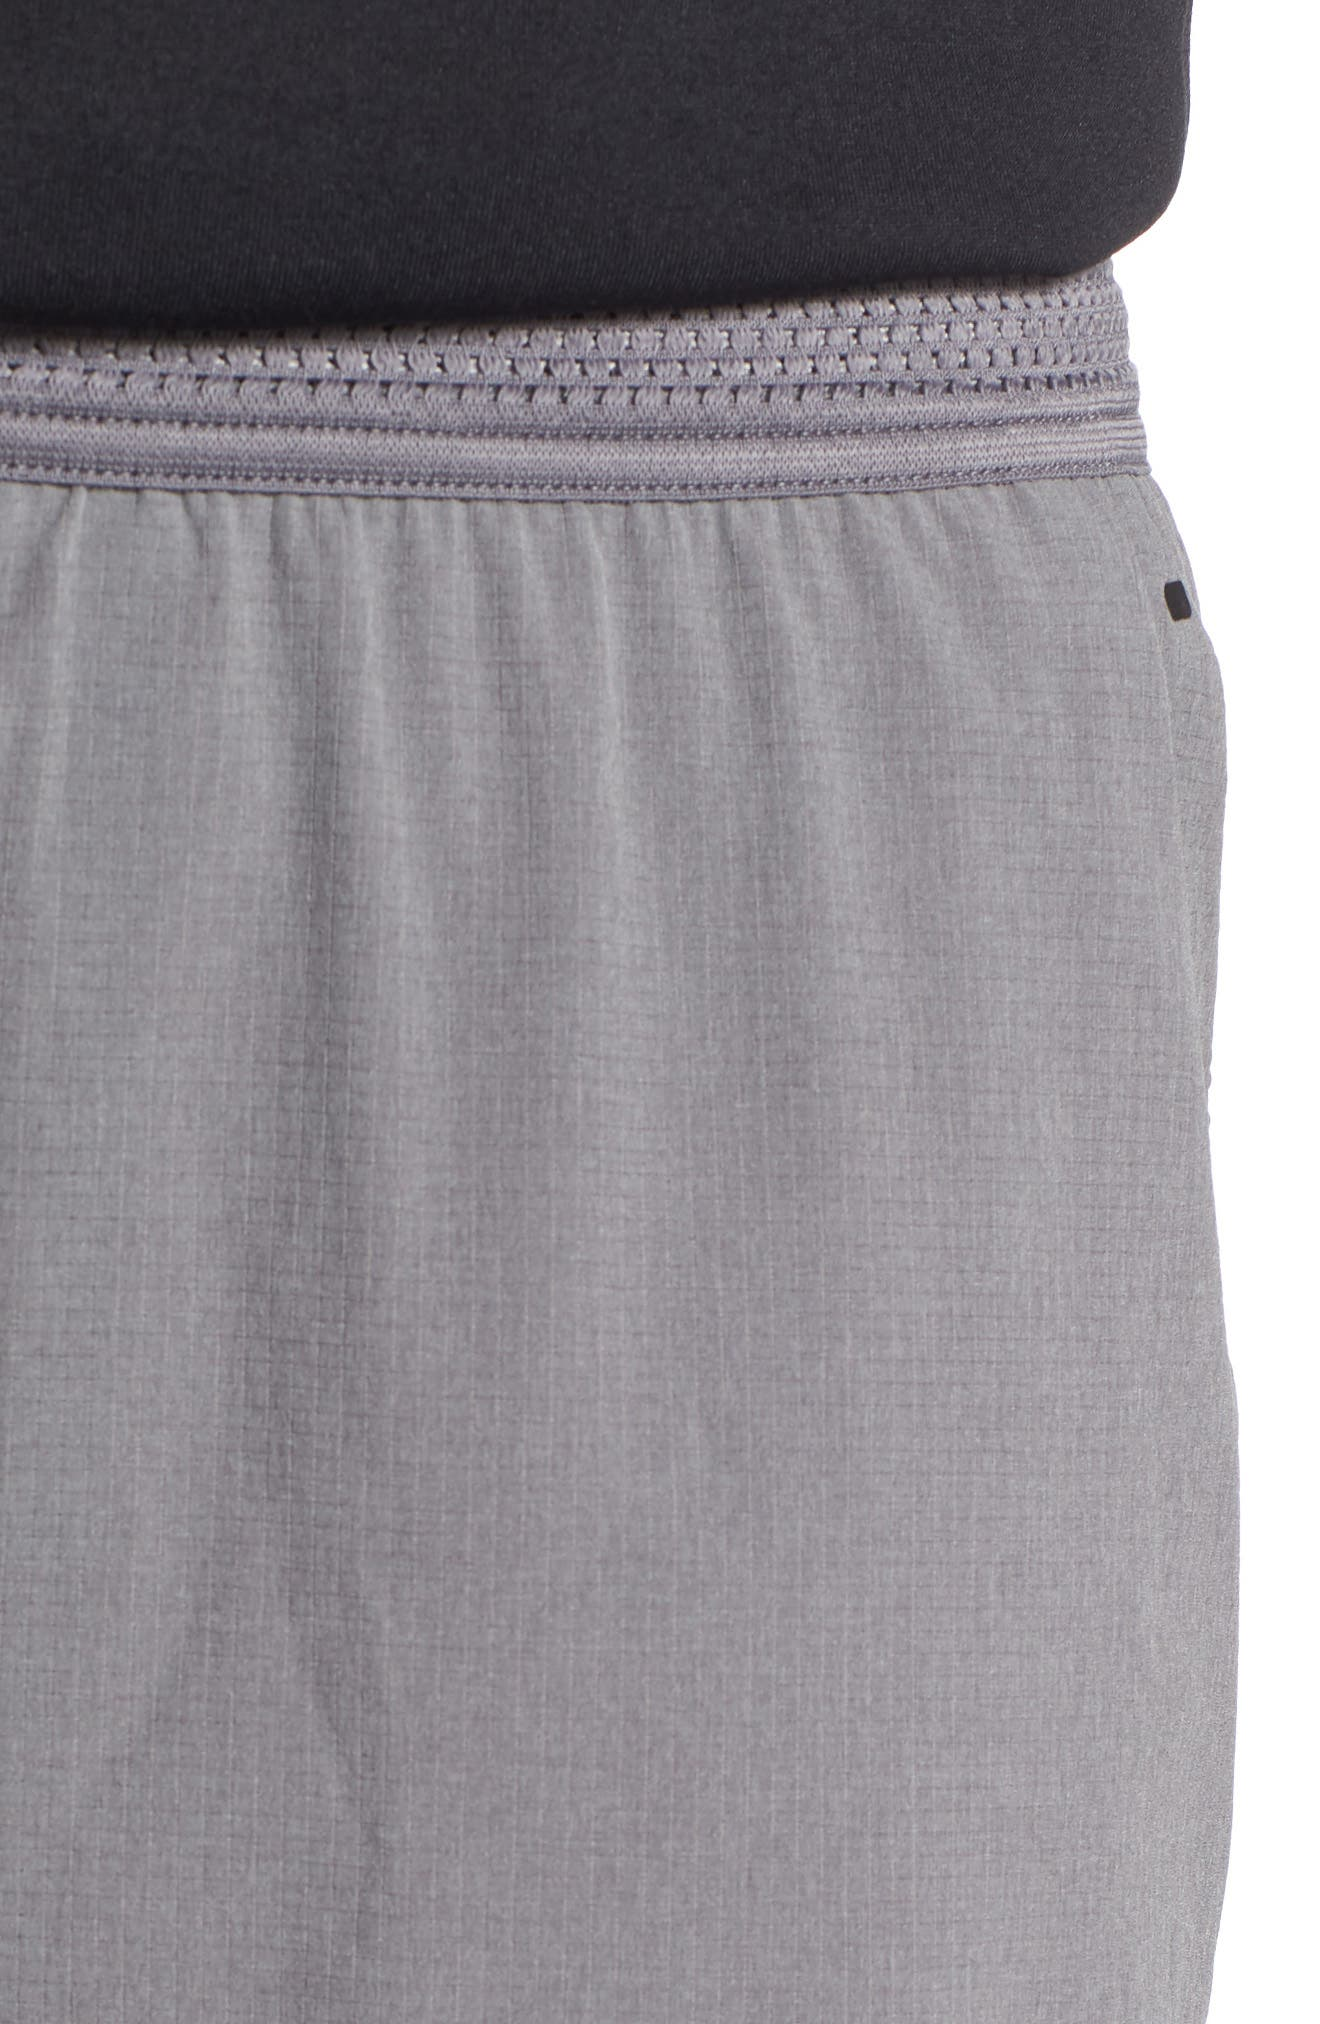 Repel 3.0 Flex Training Shorts,                             Alternate thumbnail 4, color,                             Gun Smoke/ Grey/ Black